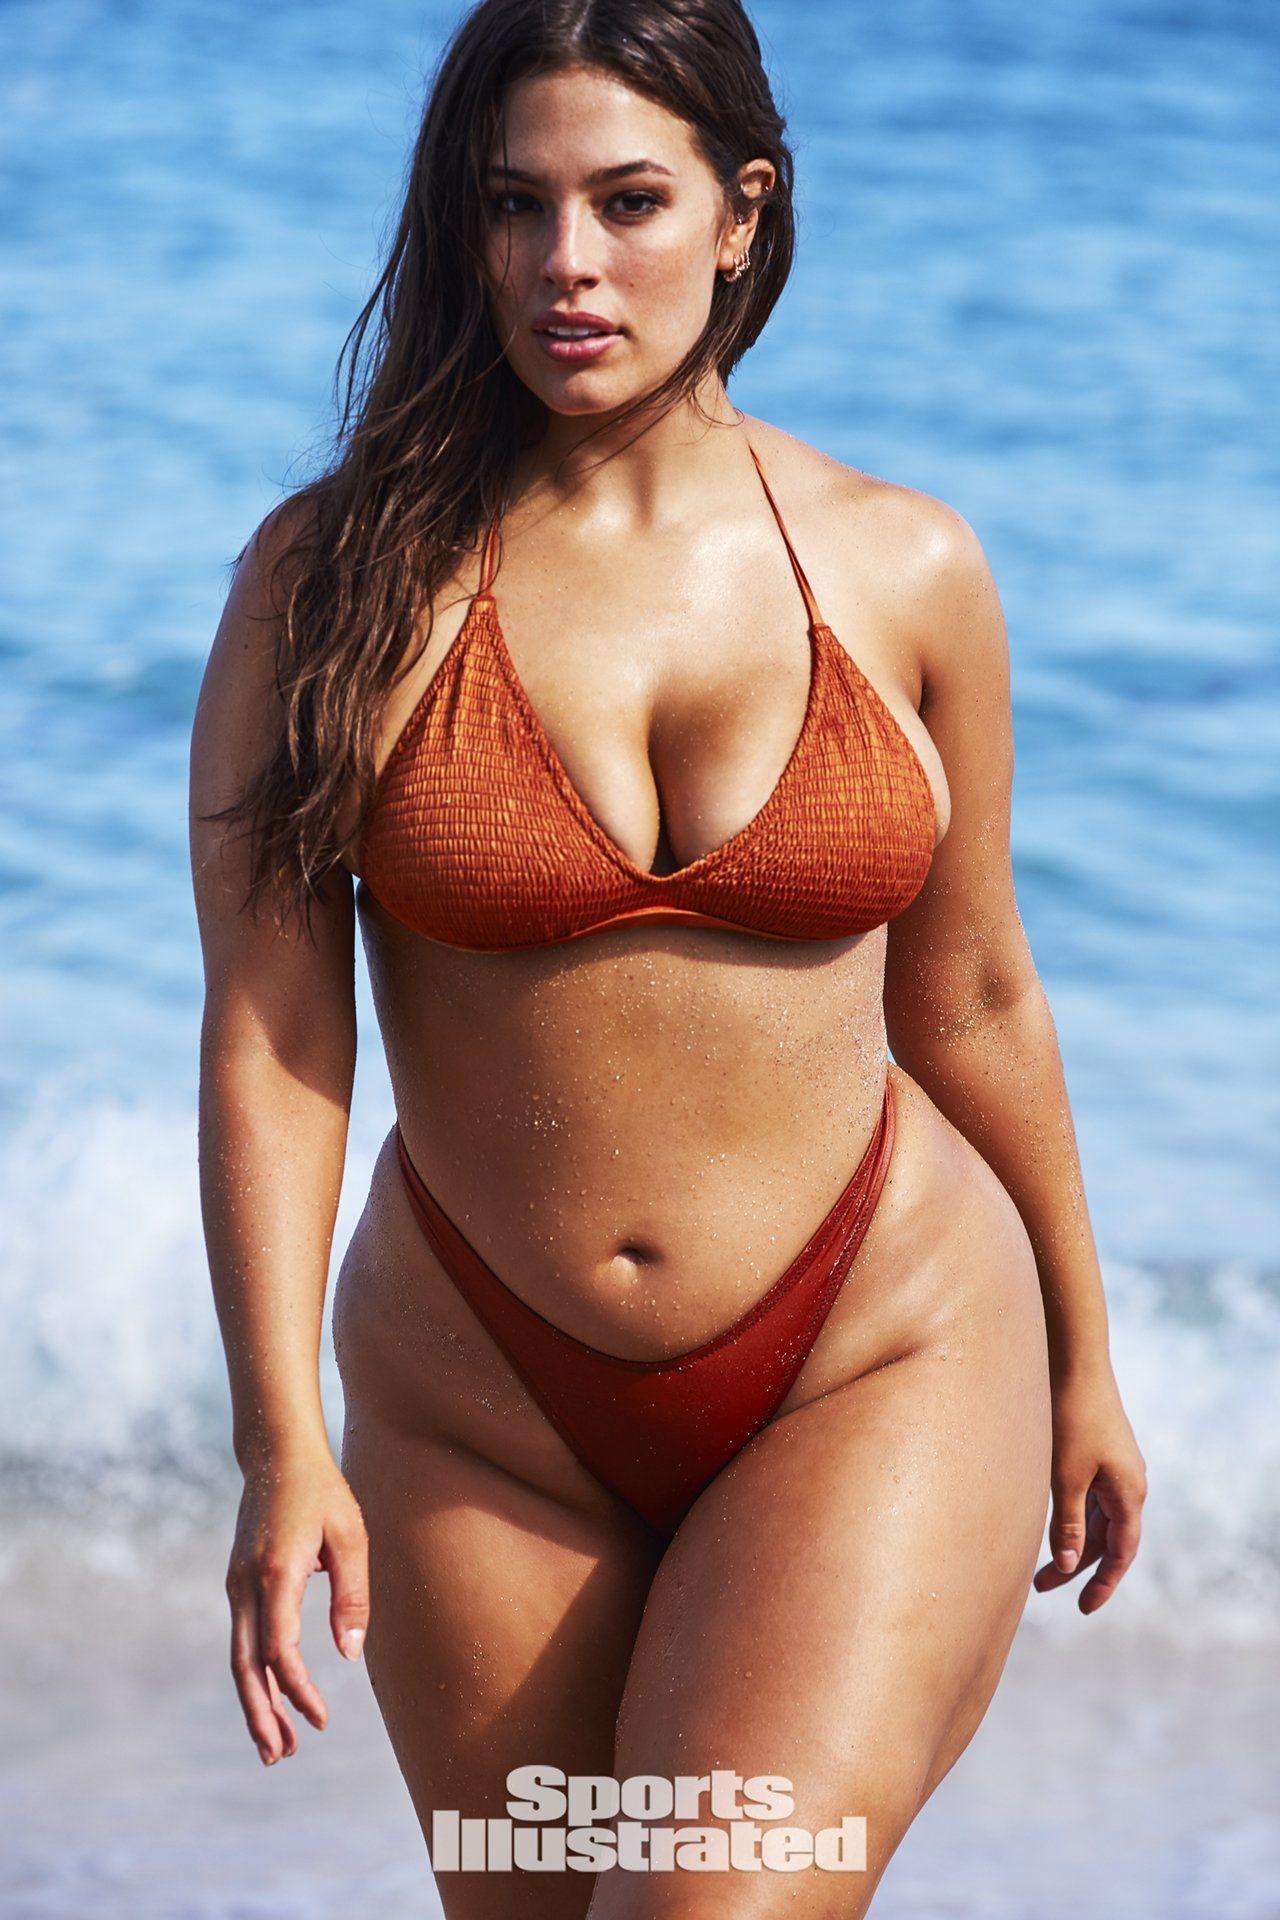 Bikini Sydney Graham nude (47 photos), Sexy, Fappening, Feet, braless 2015